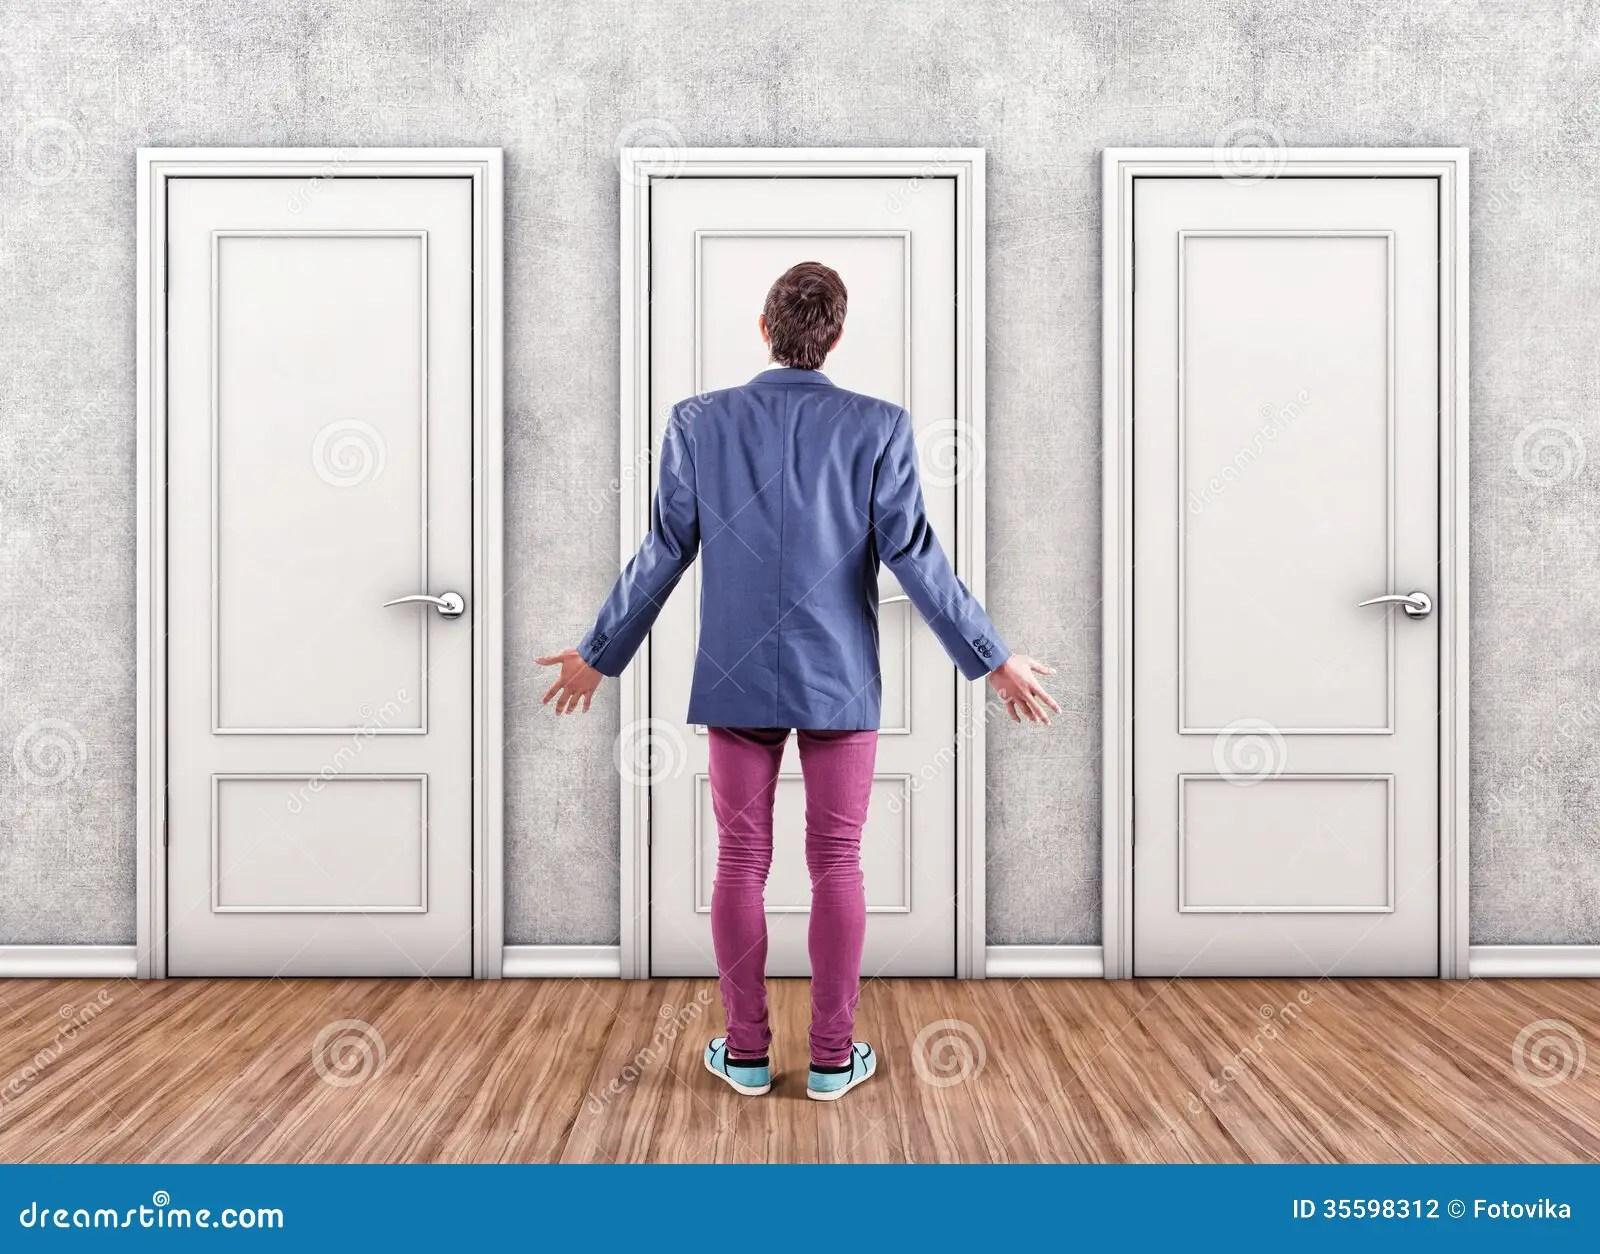 Man before a doors stock photo. Image of doors